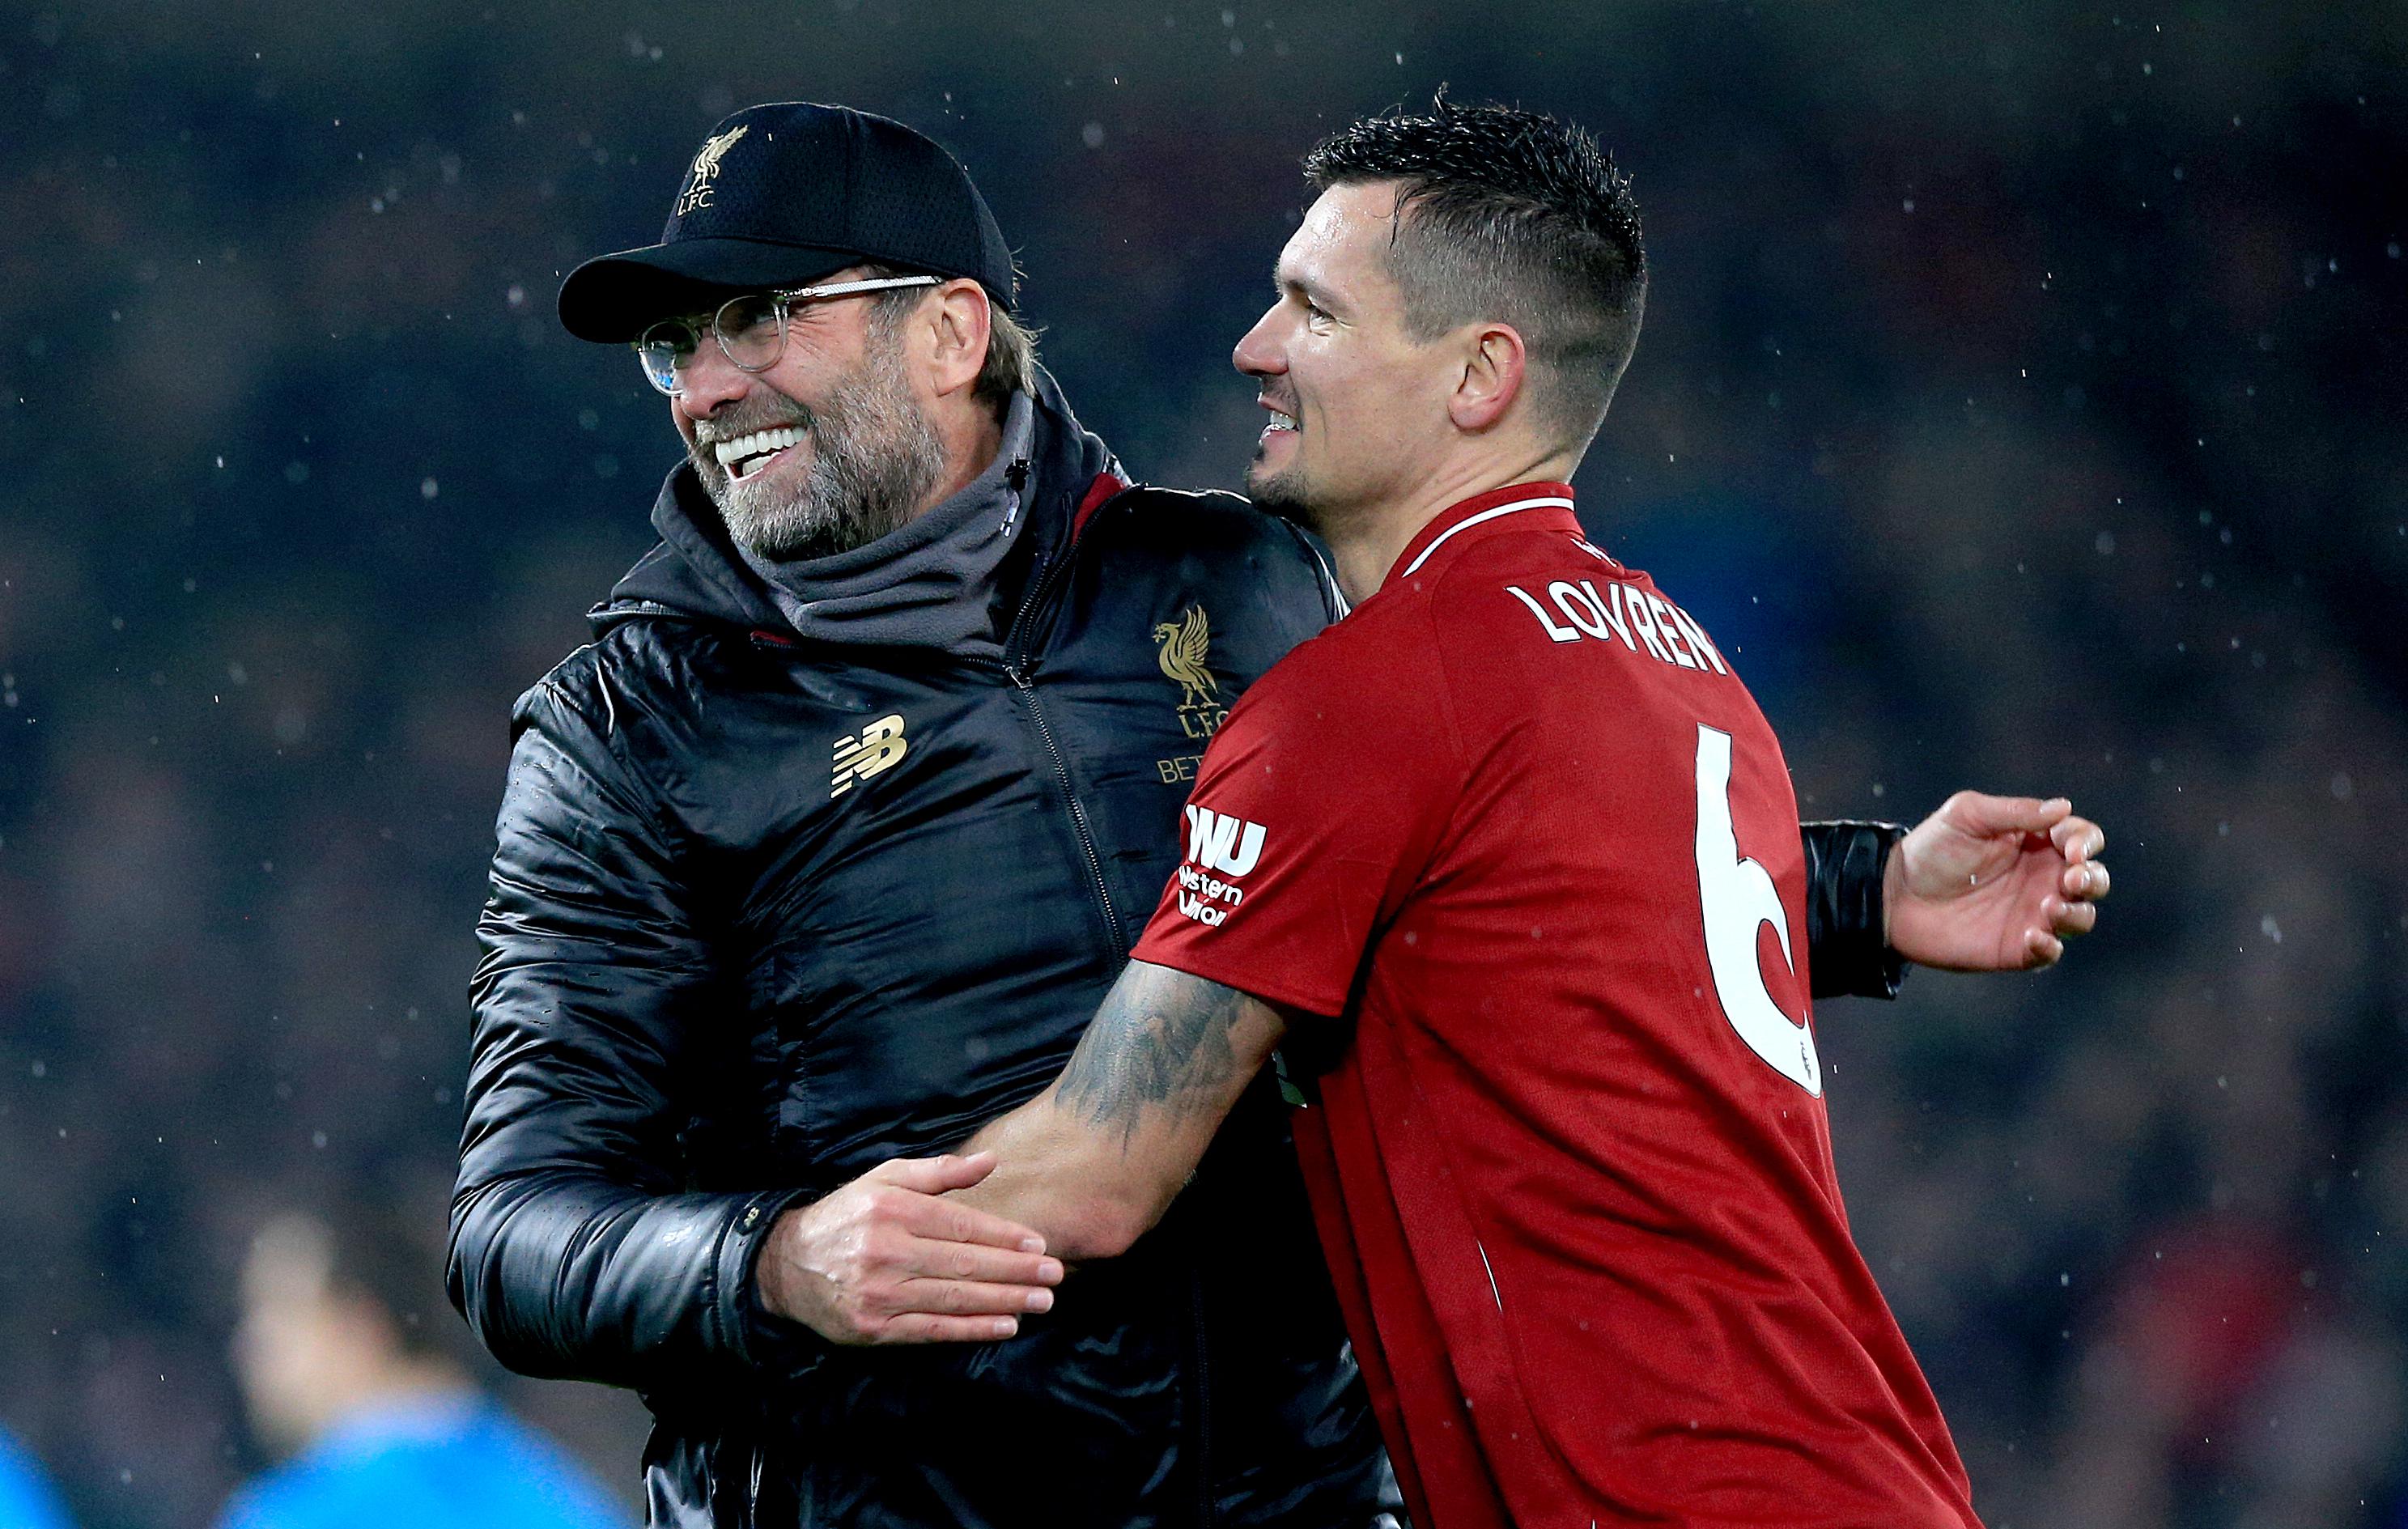 Jürgen Klopp praises Liverpool's maturity after victory at Wolves